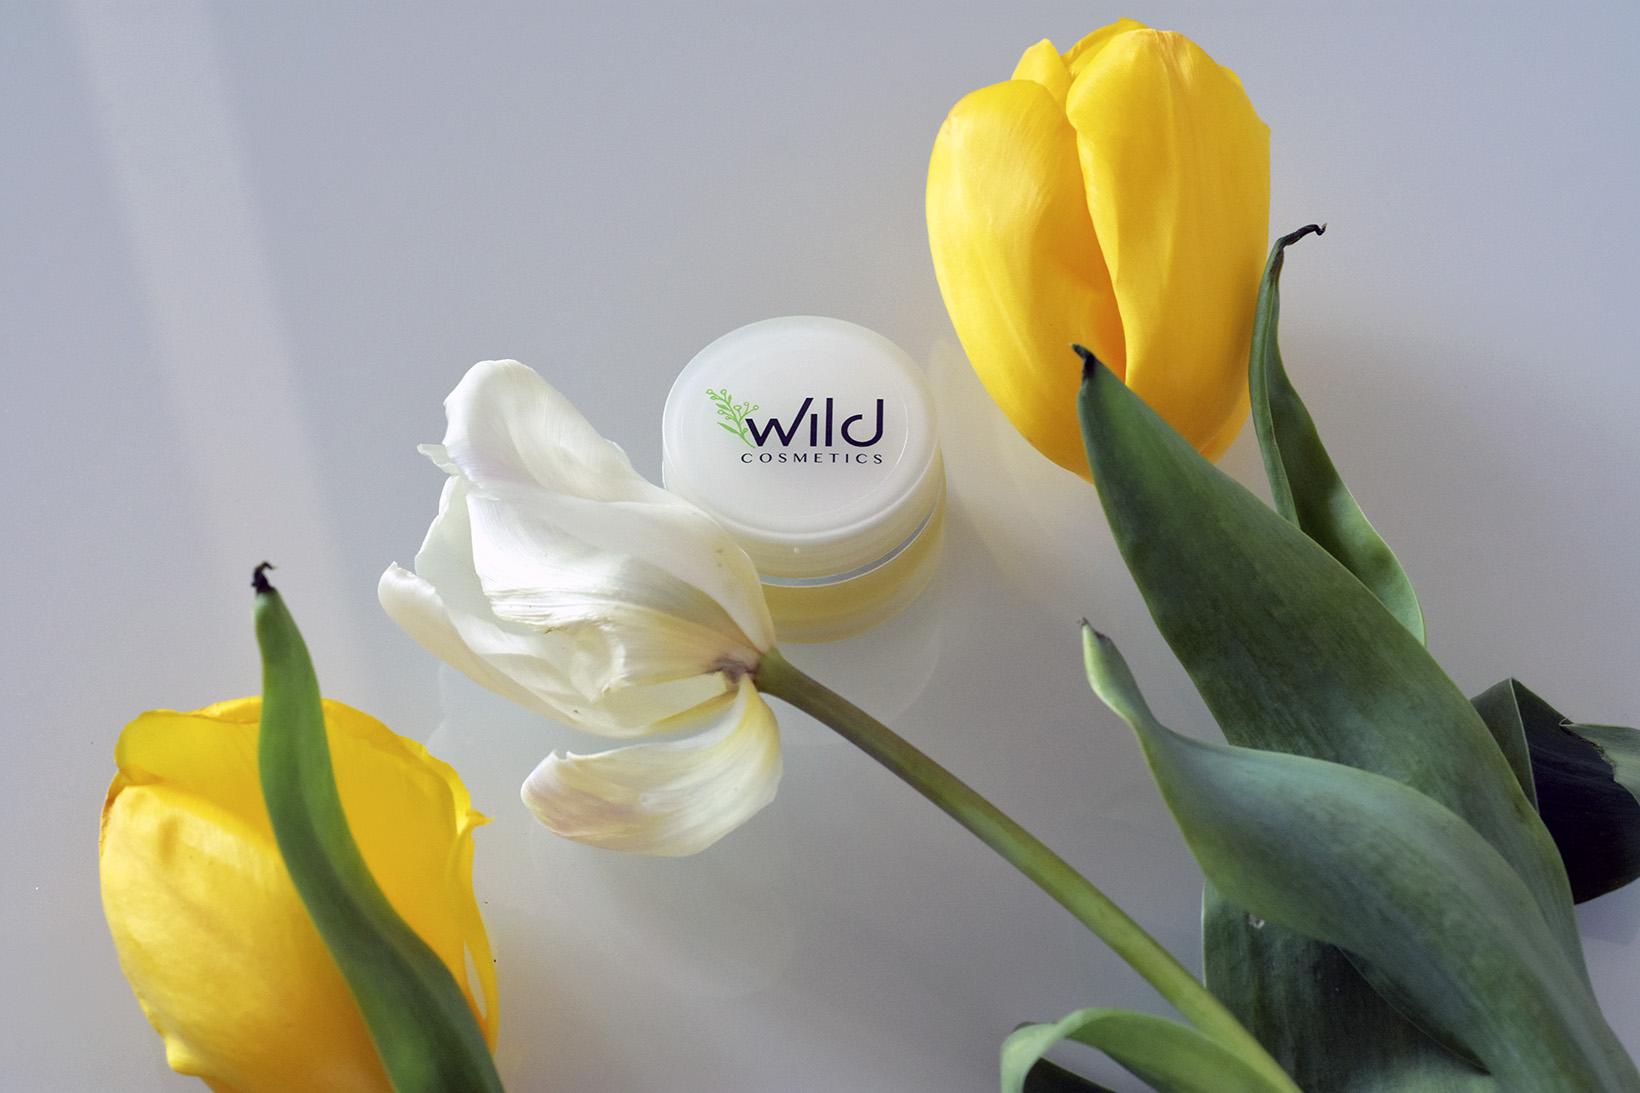 Wild cosmetics night balm